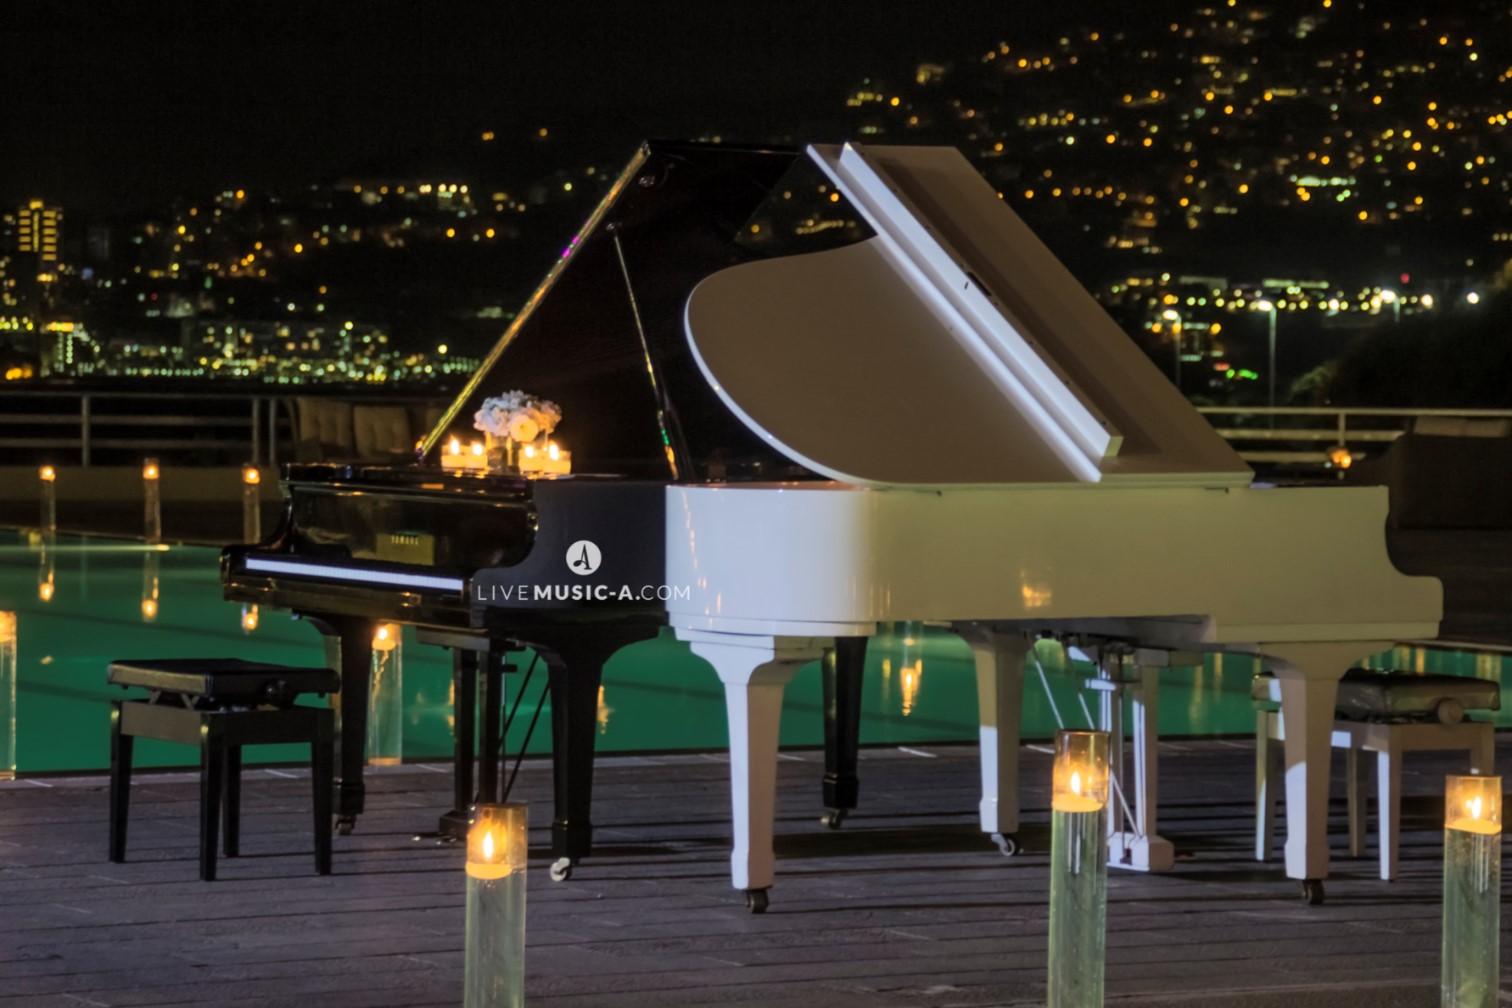 yin tang pianos